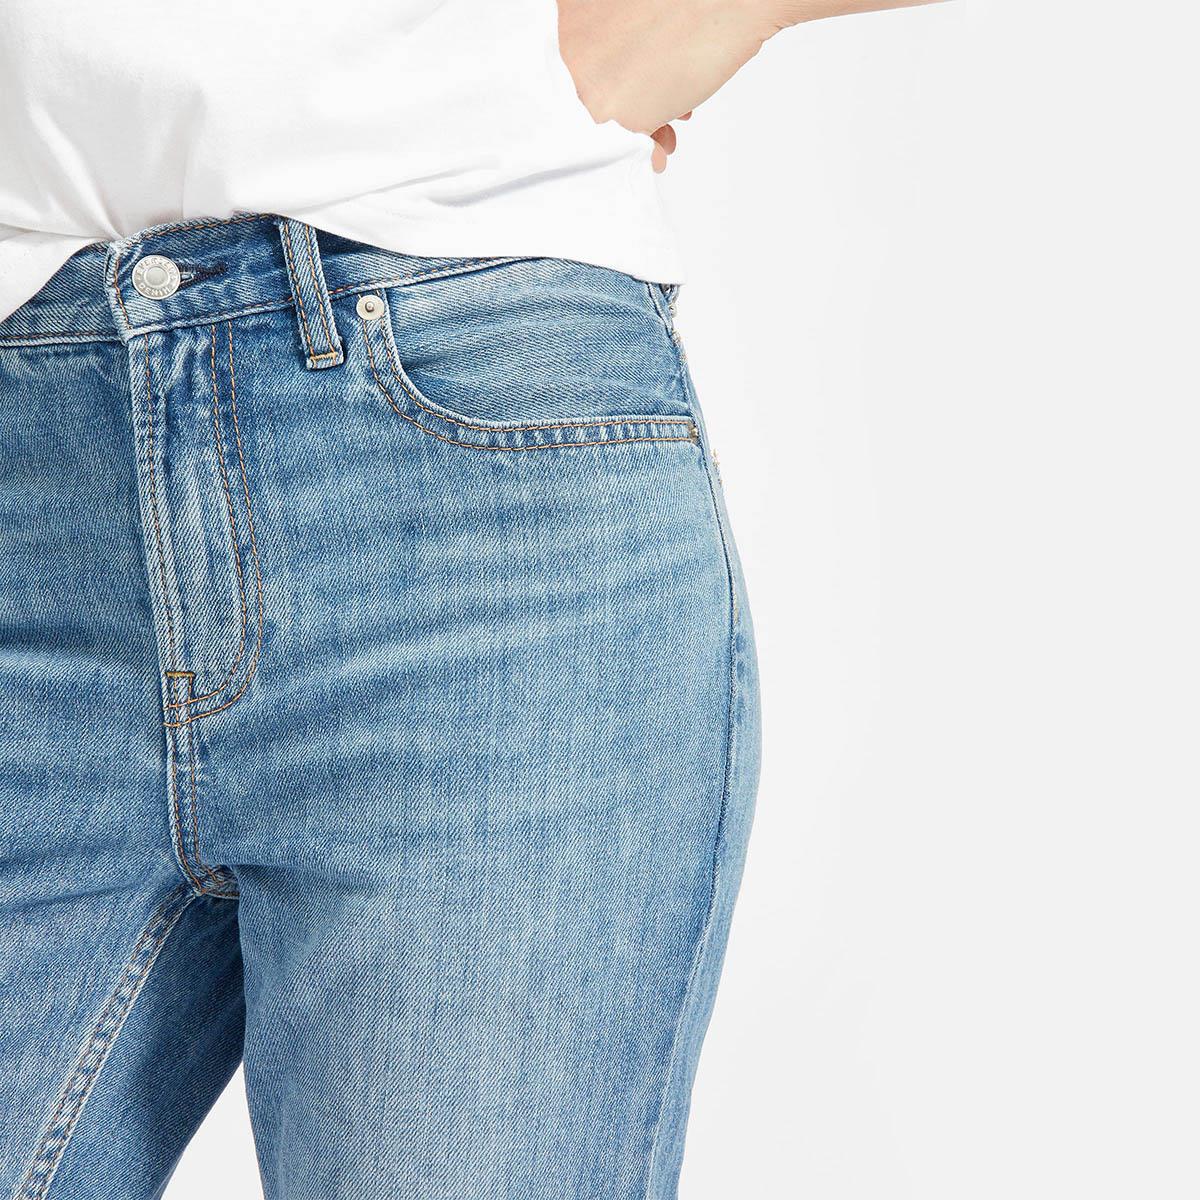 everlane lightweight jeans